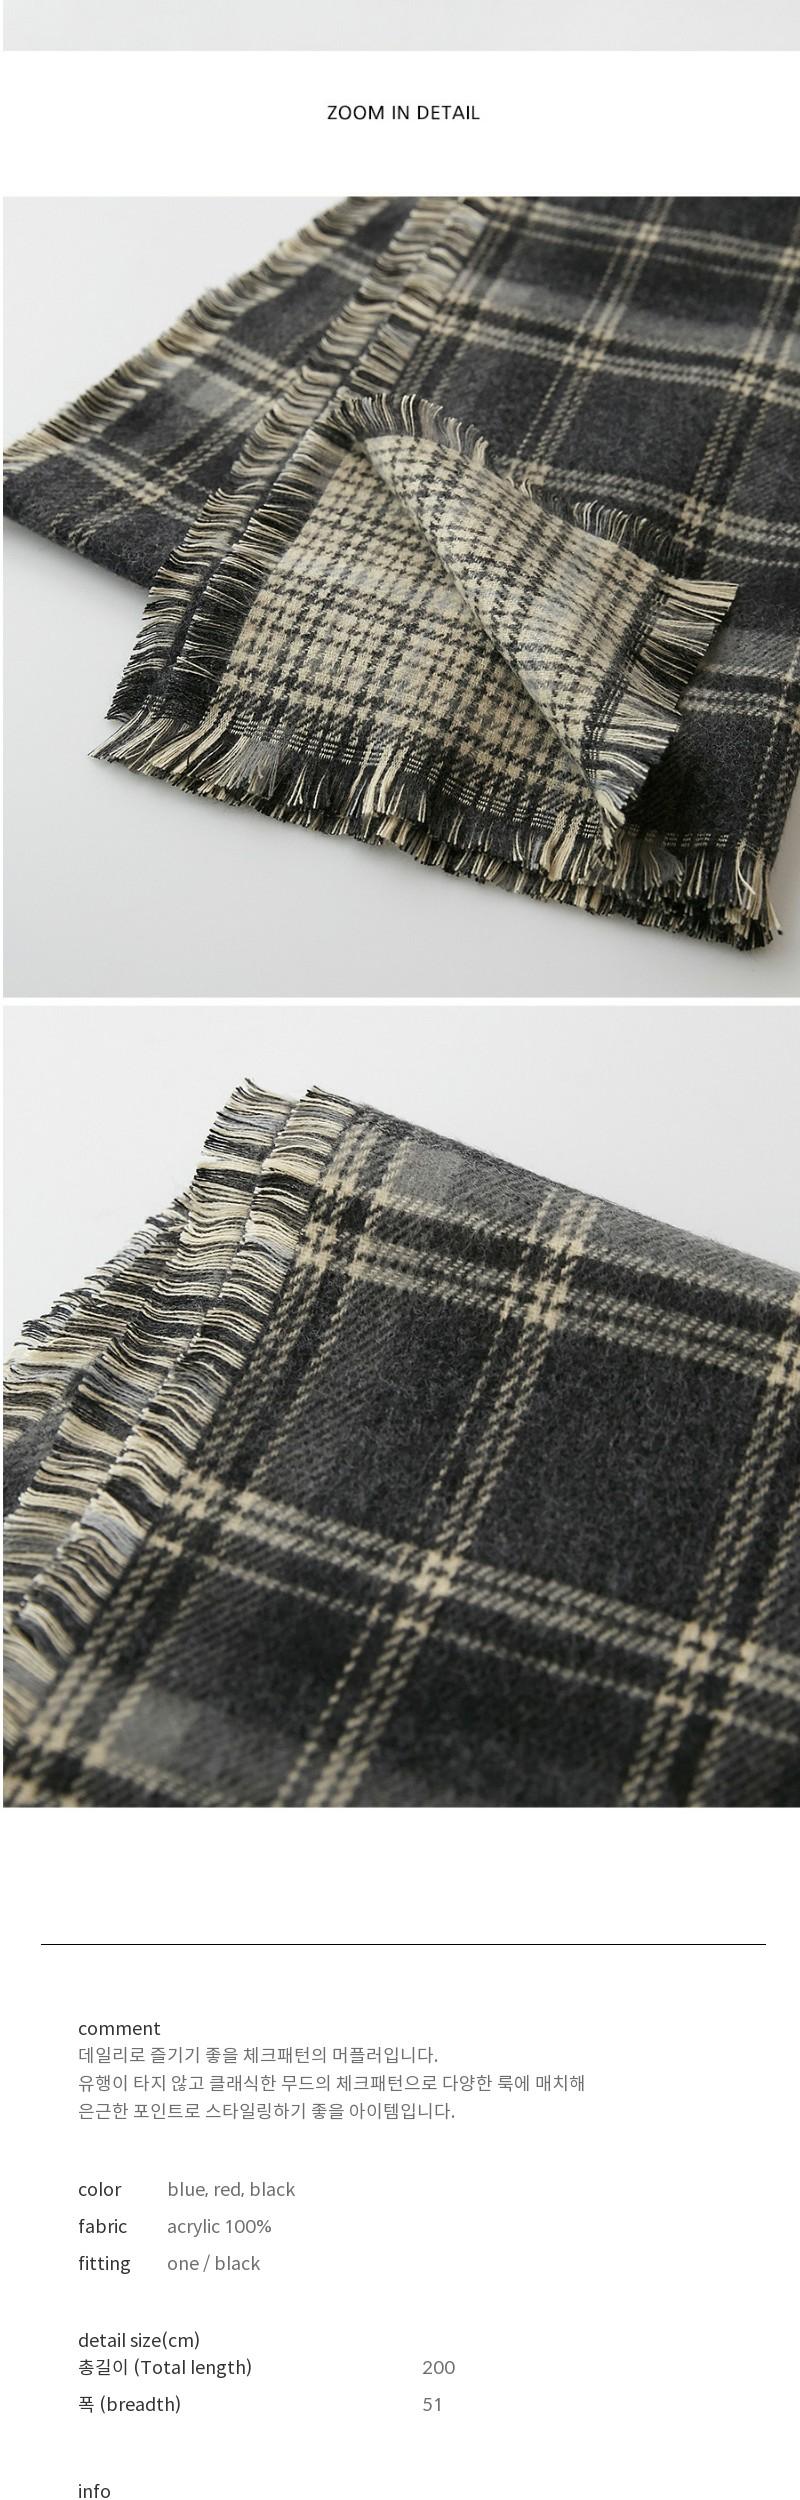 vintage check tassel muffler